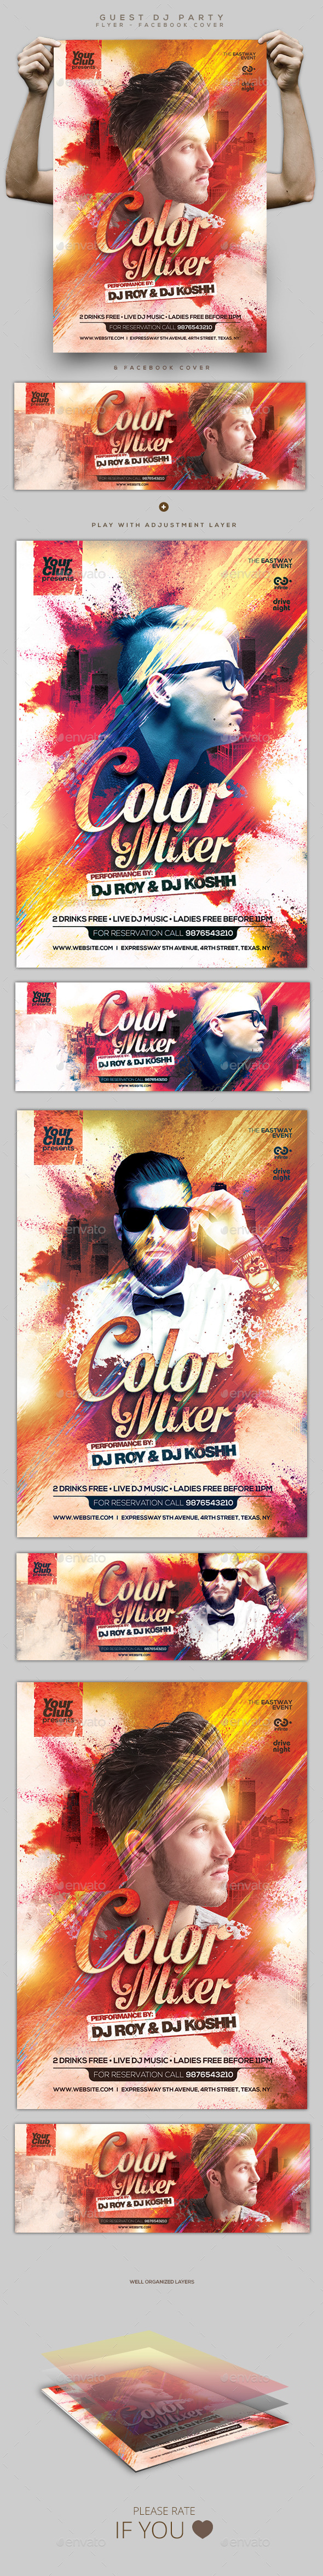 Color Mixer Guest DJ Flyer / Facebook Cover - Clubs & Parties Events